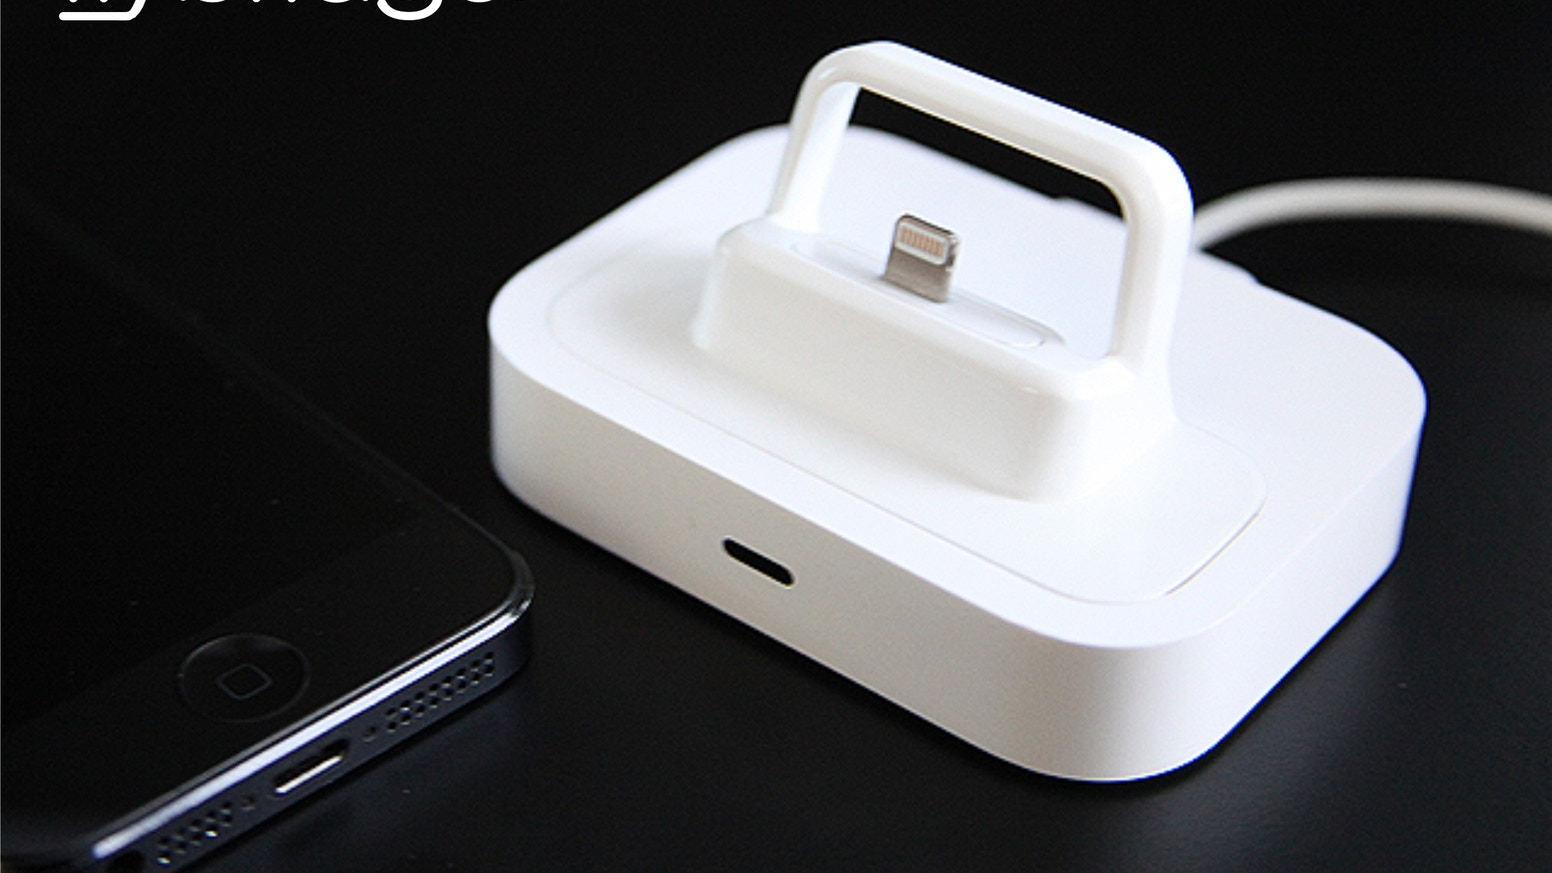 Flybridge, the iPhone/iPad Lightning Dock adapter by Jason Bird